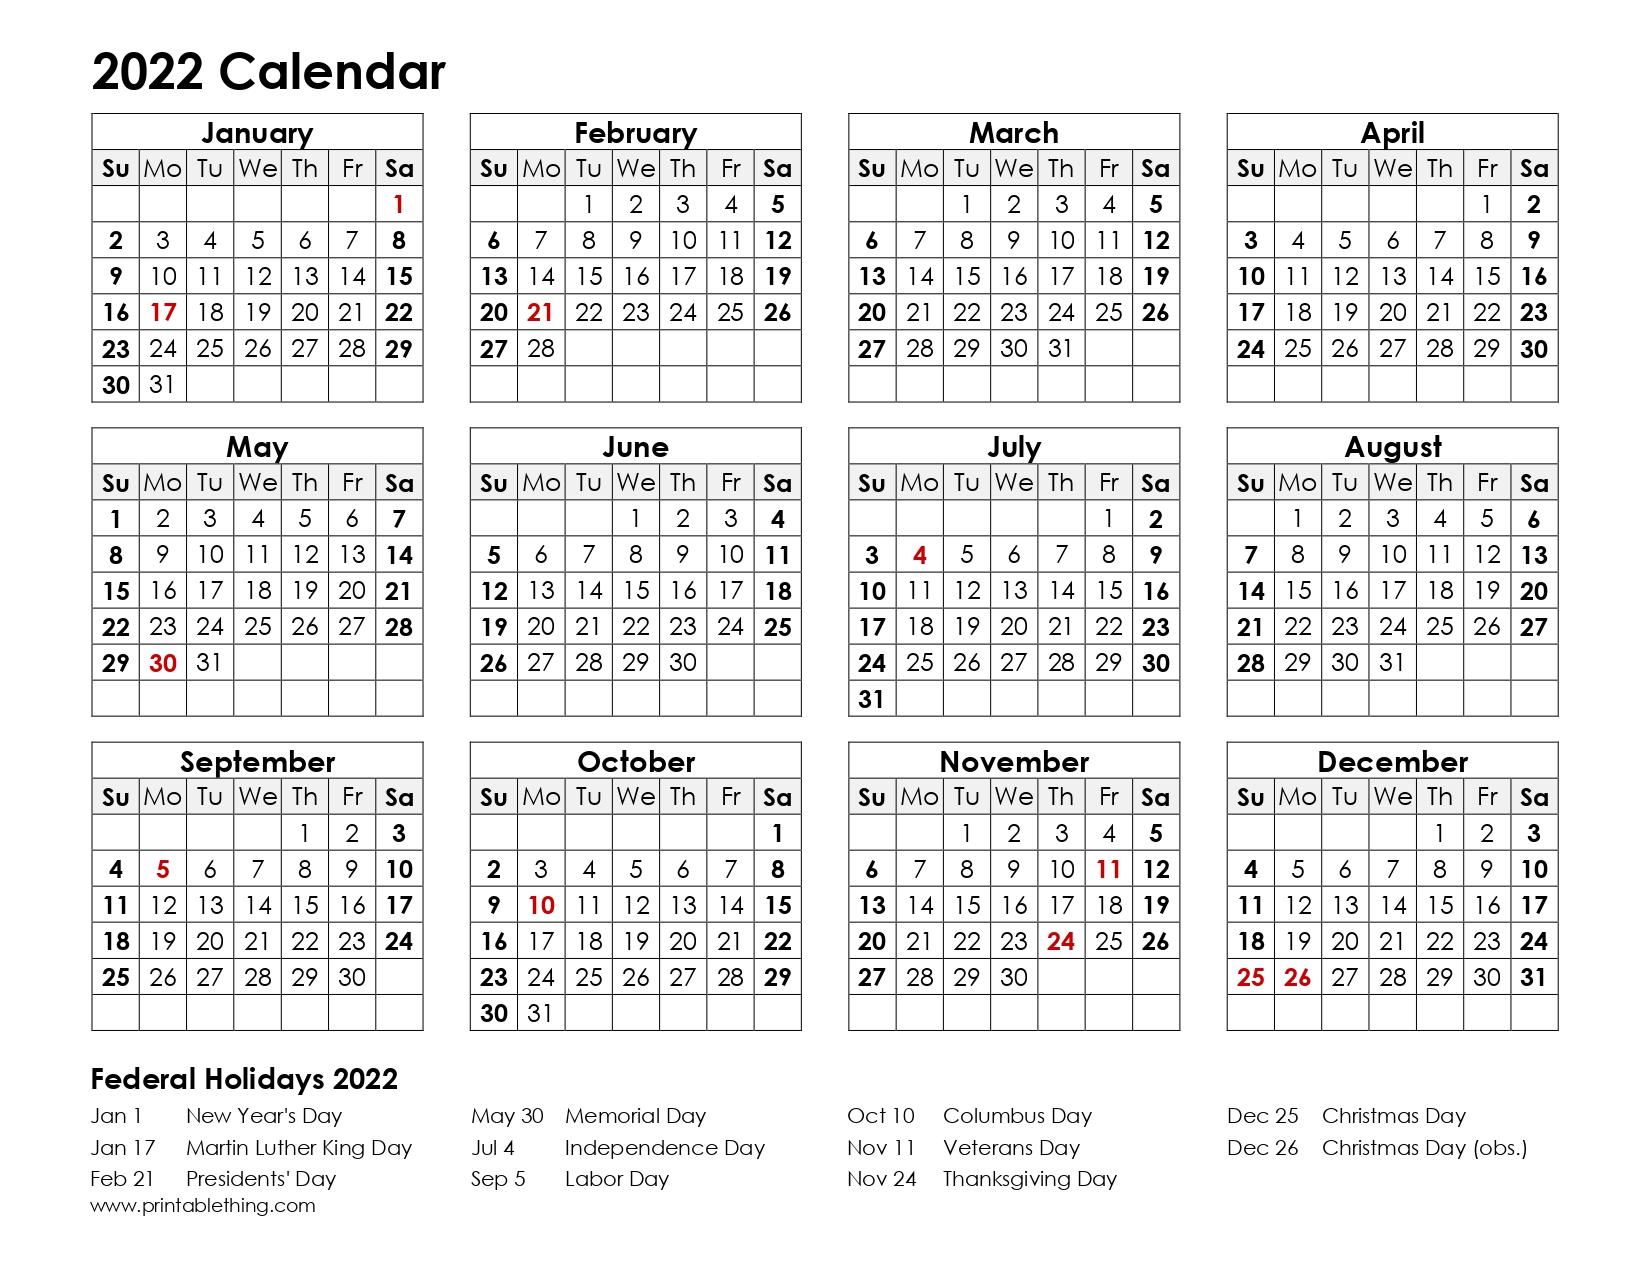 2022 One Page Calendar.2022 Calendar Printable Pdf 2022 Calendar Printable One Page Usa